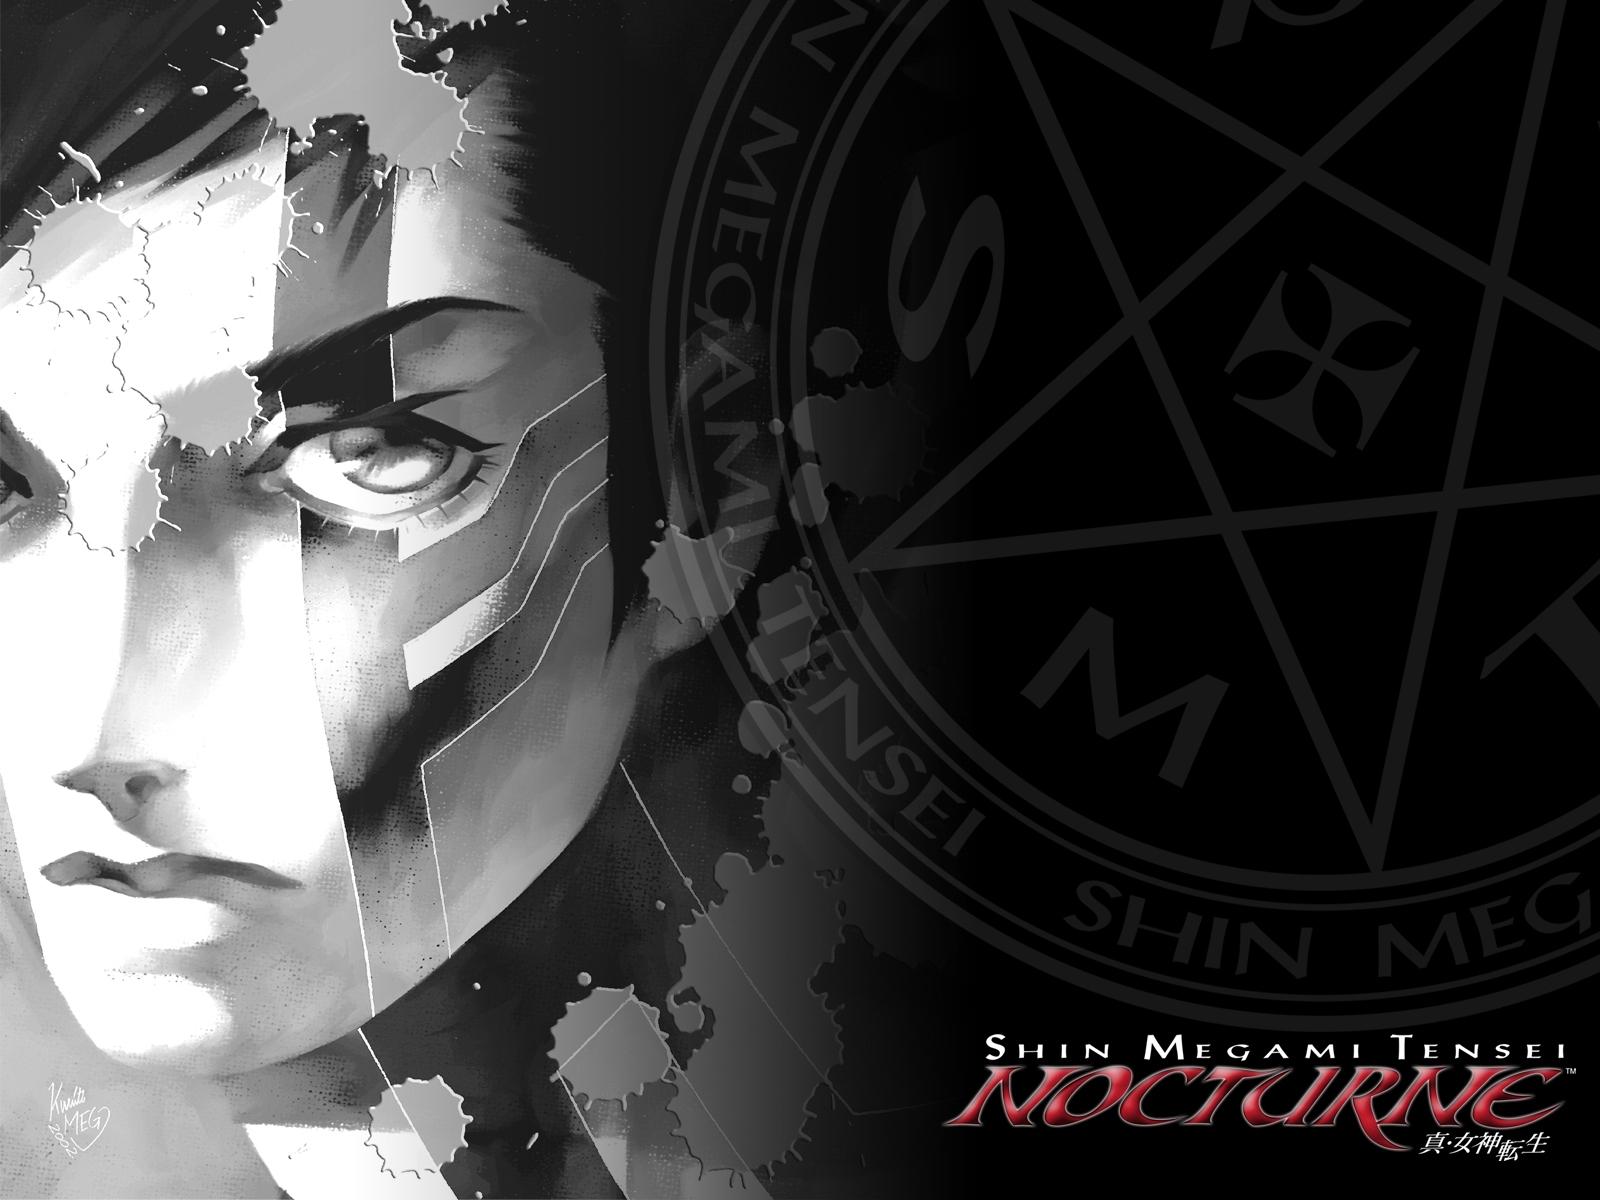 atlus usa presents shin megami tensei: nocturne